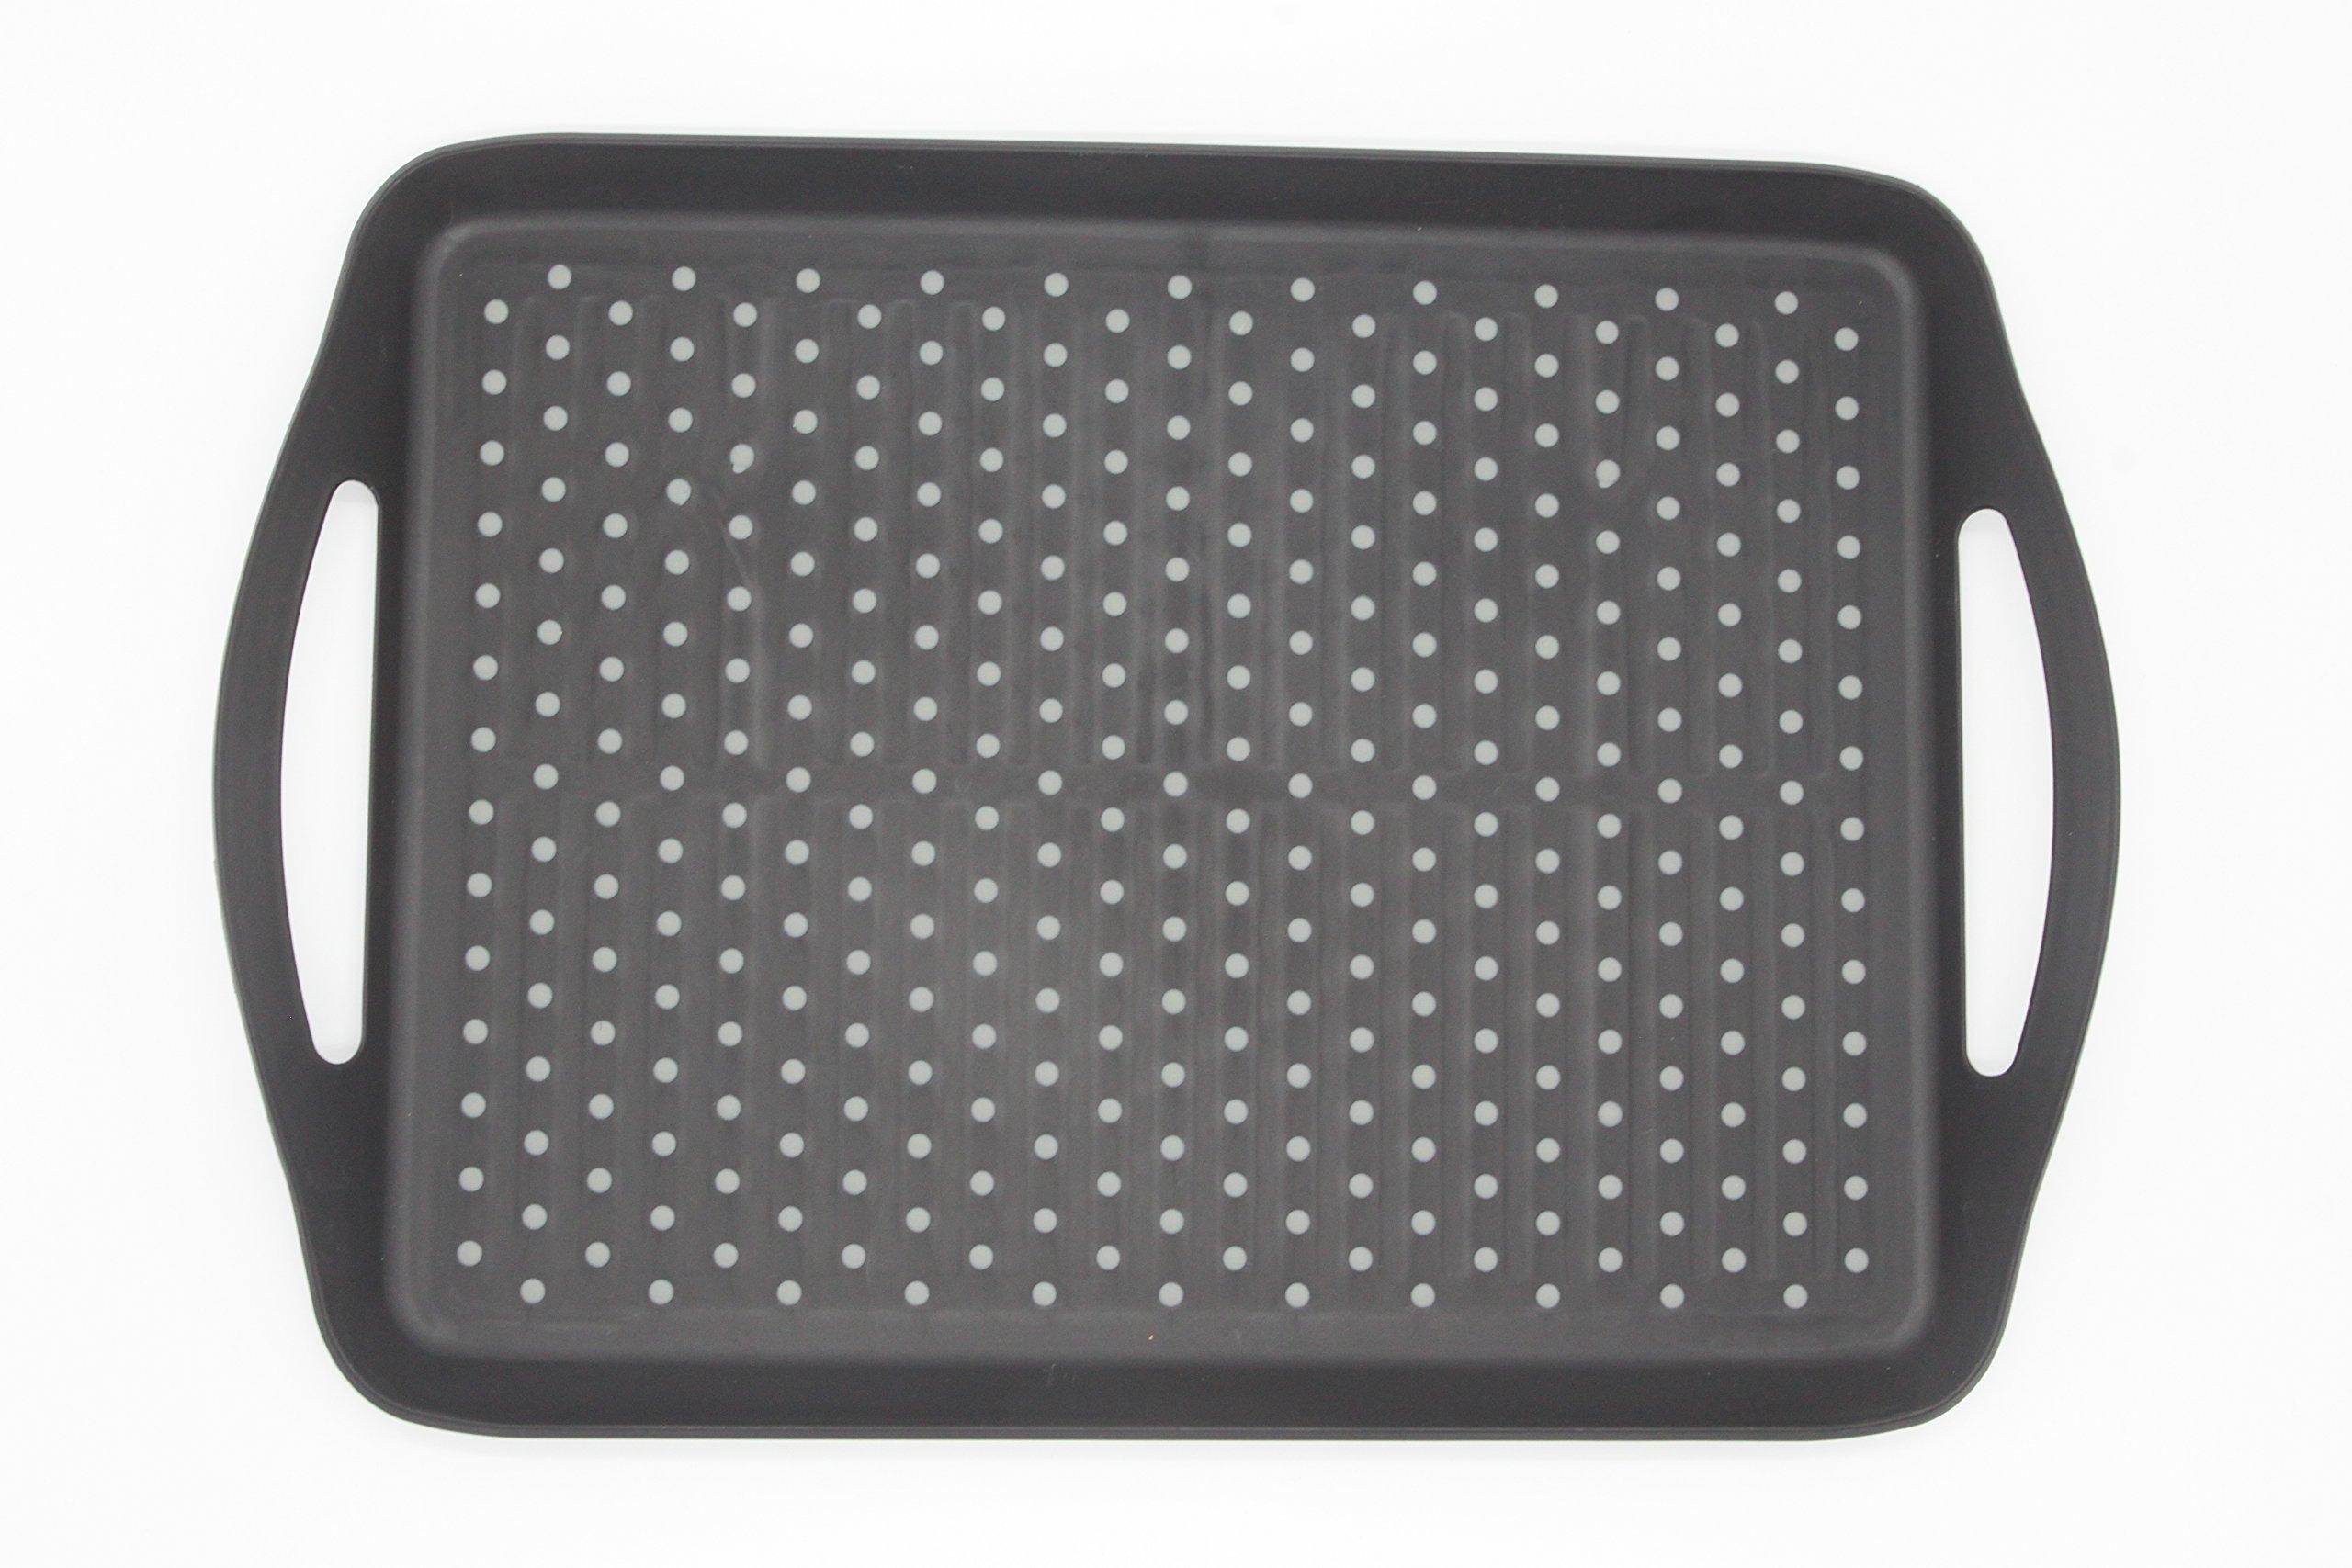 ChopMaster Rectangular Anti Slip Serving Tray with Handle (large, Black)